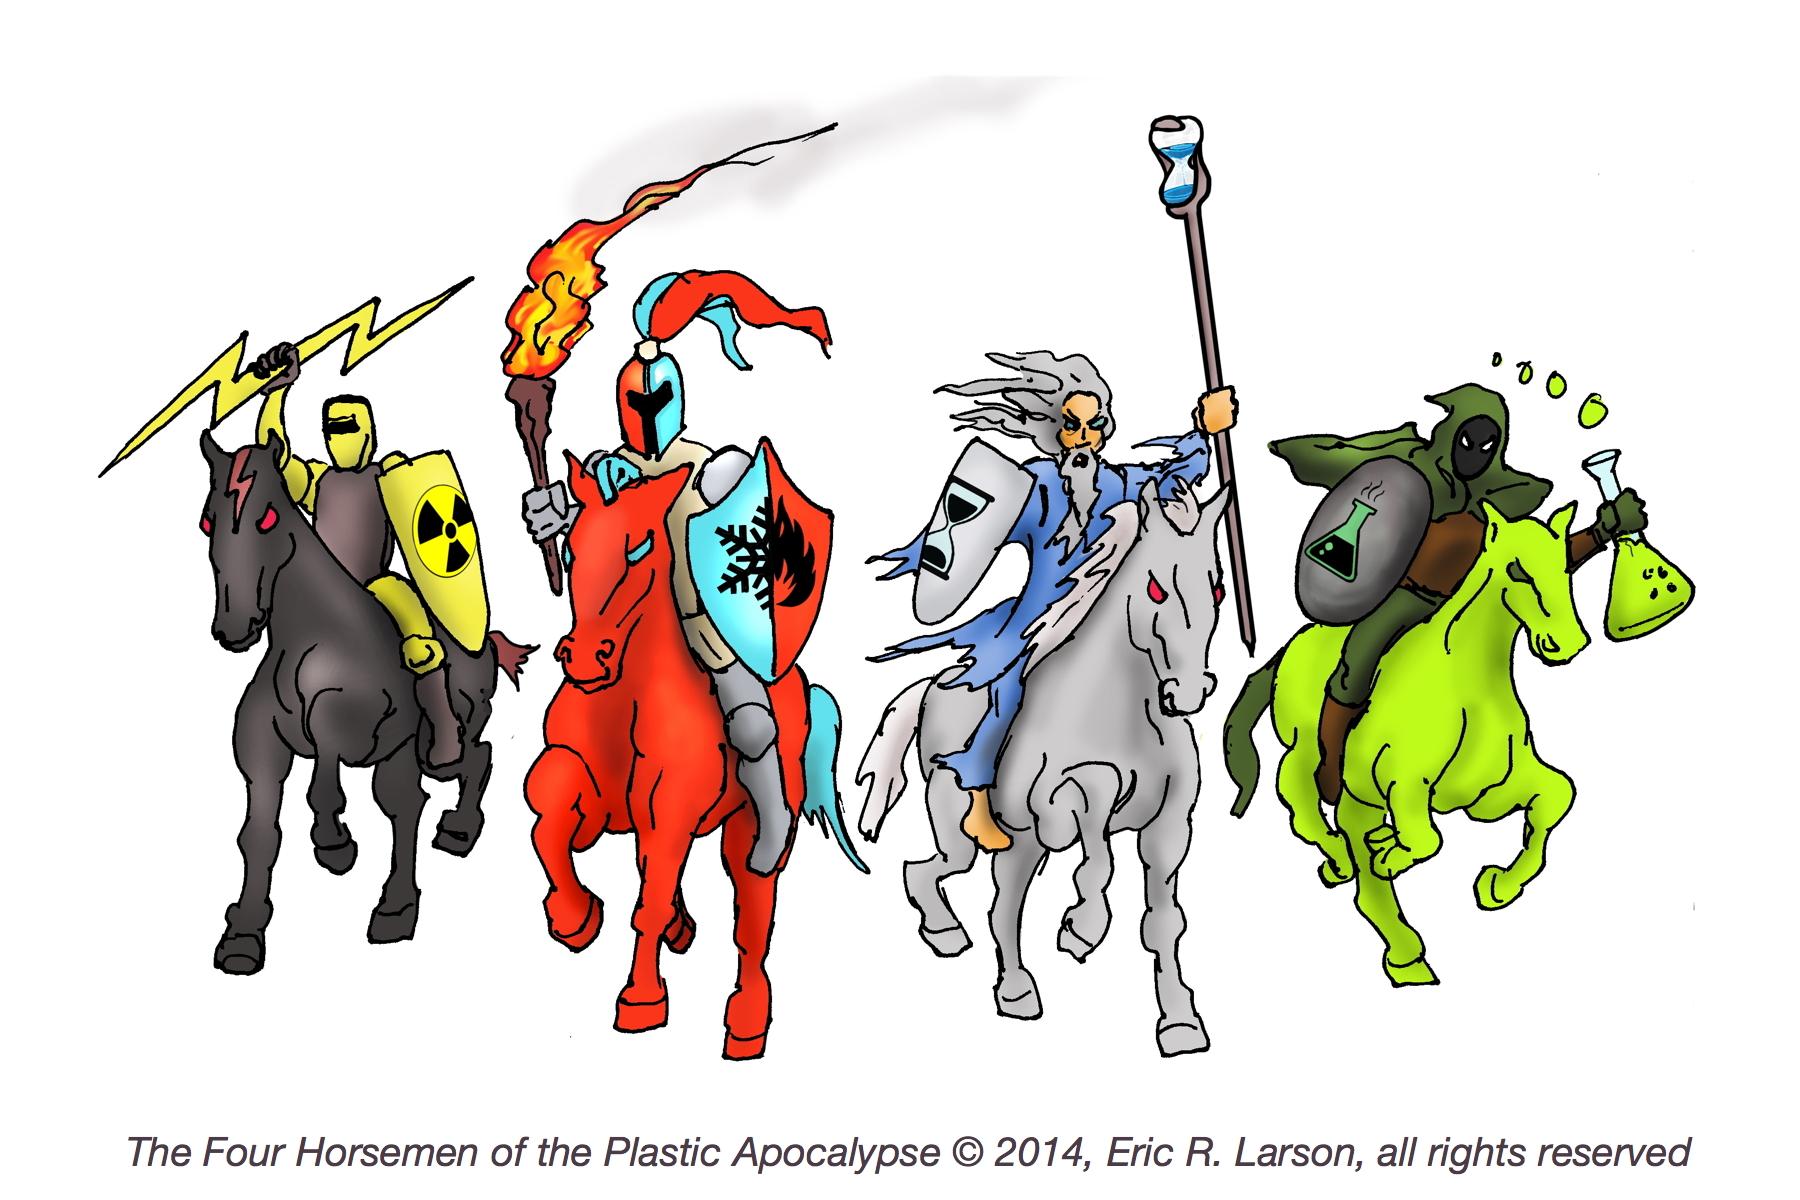 The Four Horsemen of the Plastic Apocalypse